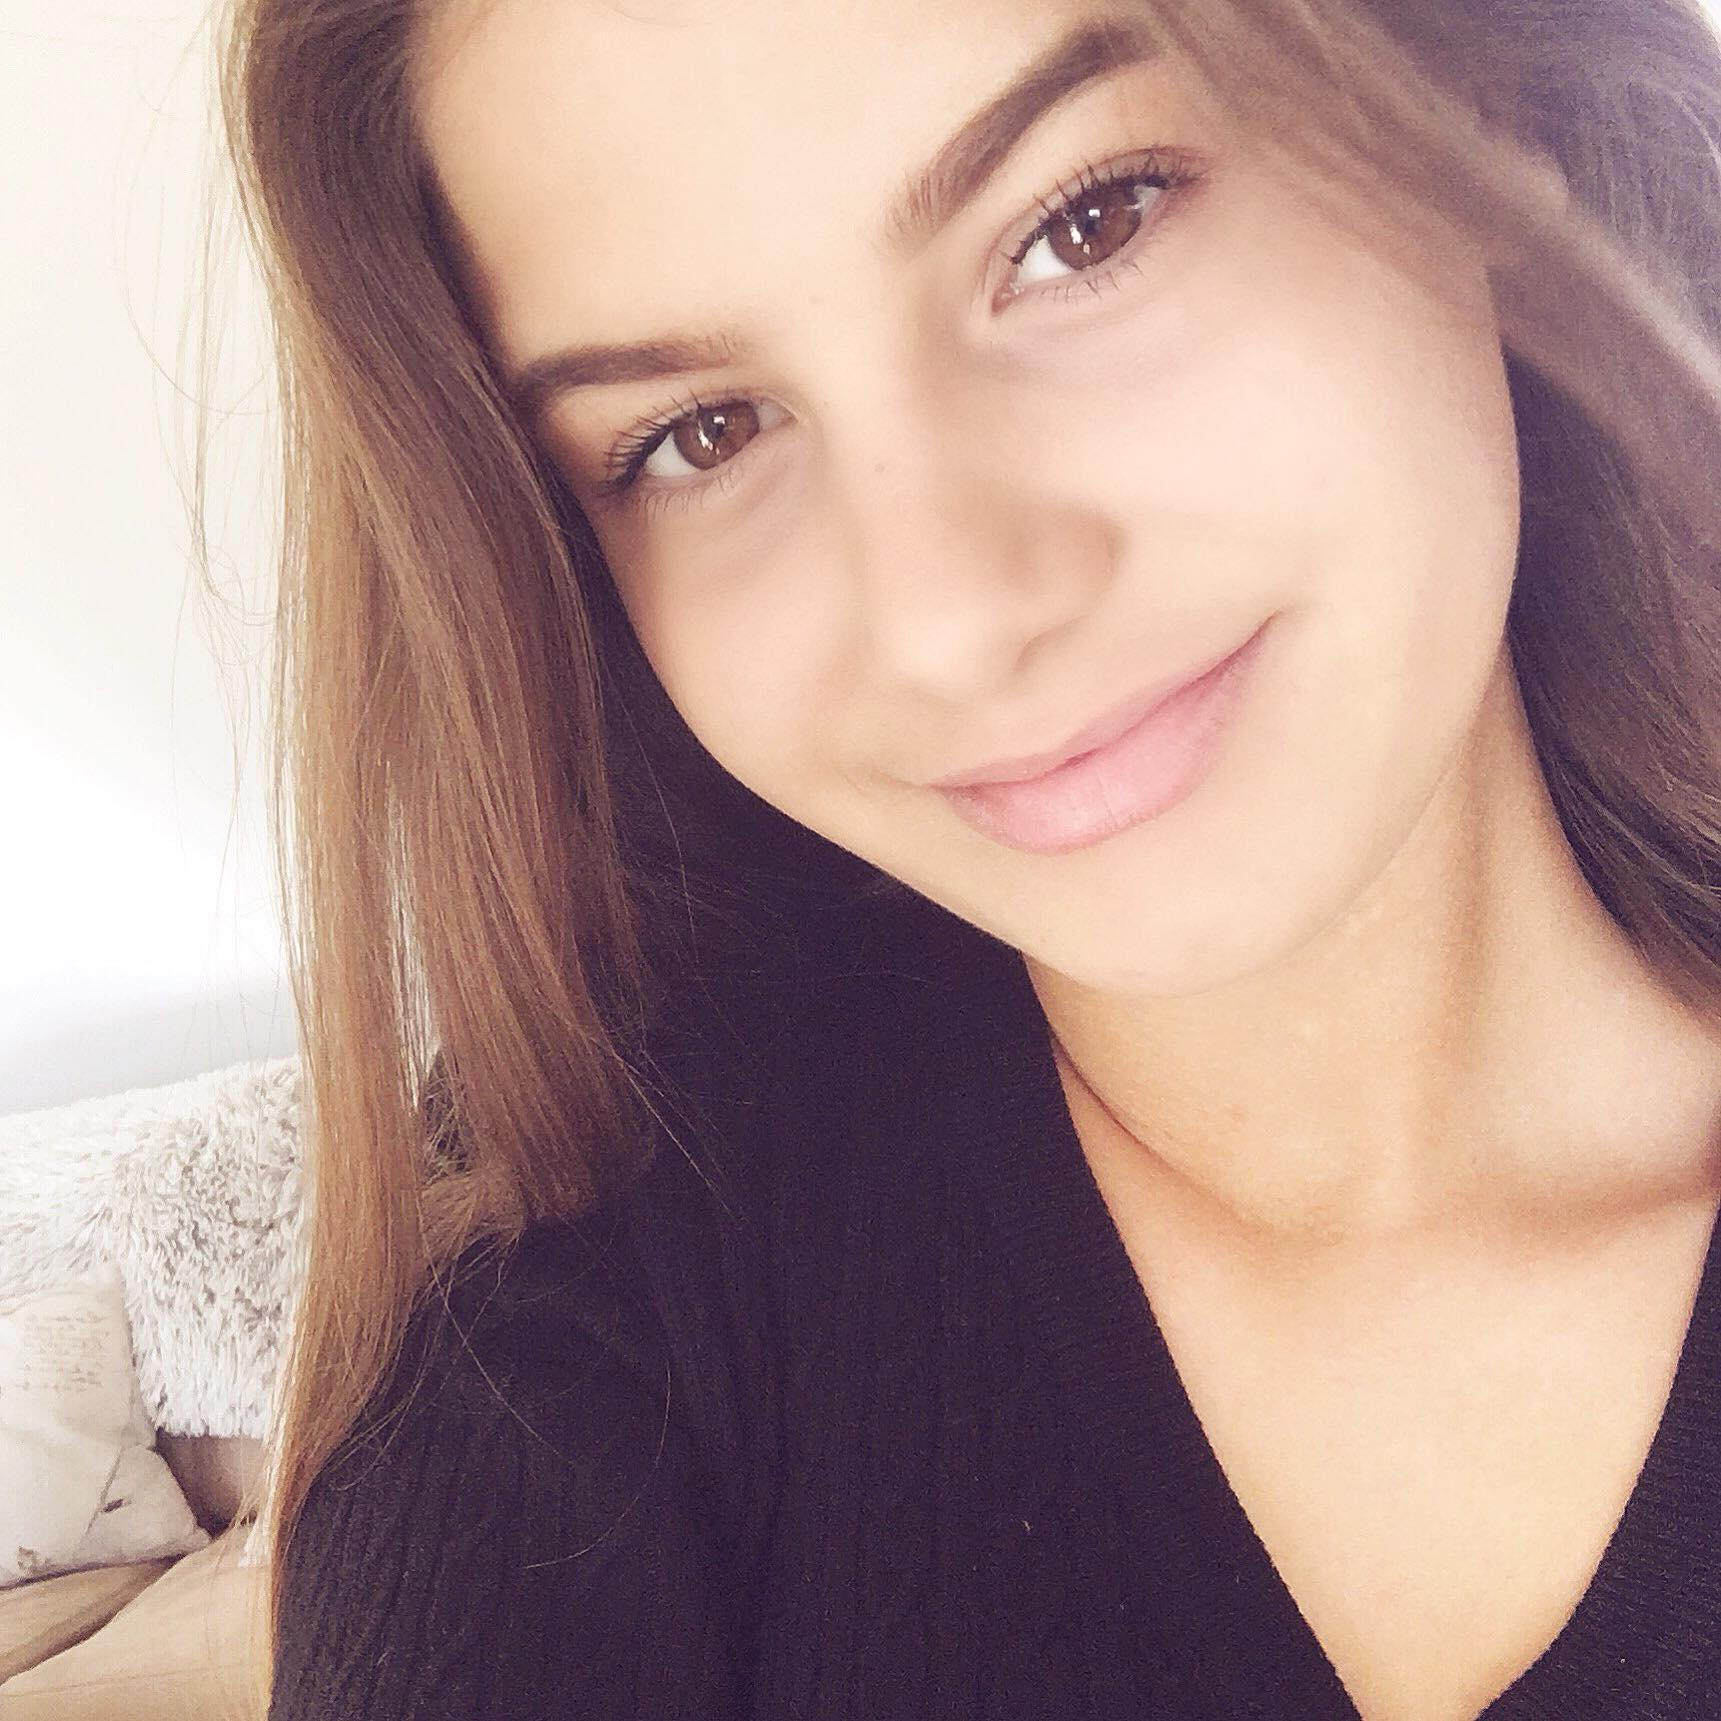 Sasha Nielsen